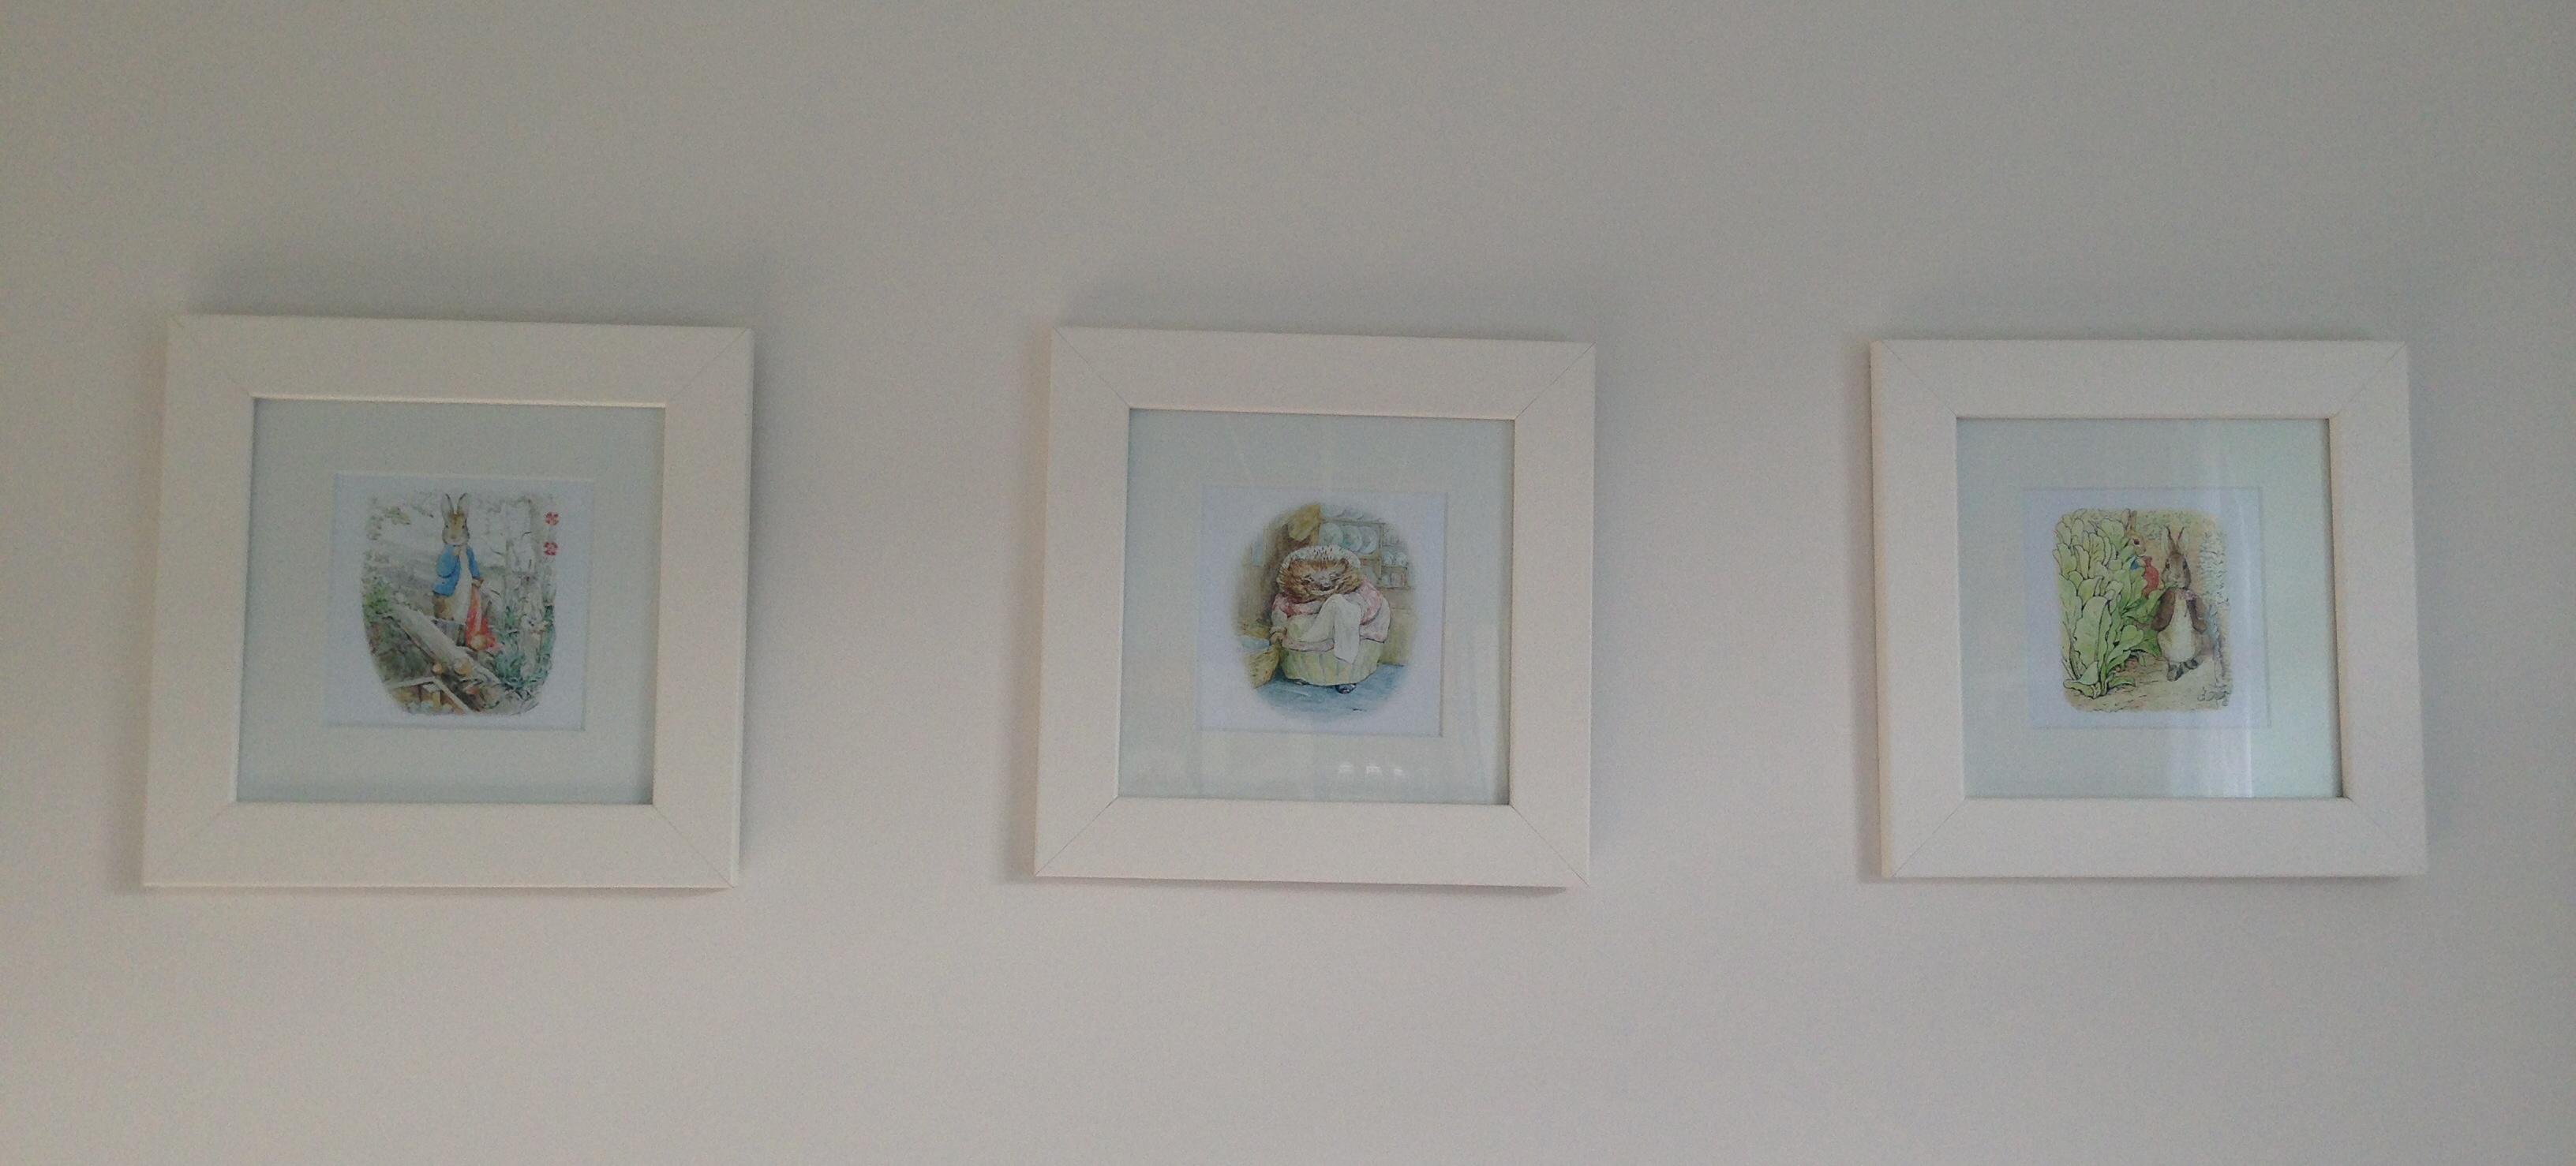 nursery decor ideas our fairytale adventure peter rabbit mrs tiggywinkle and benjamin bunny beatrix potter prints